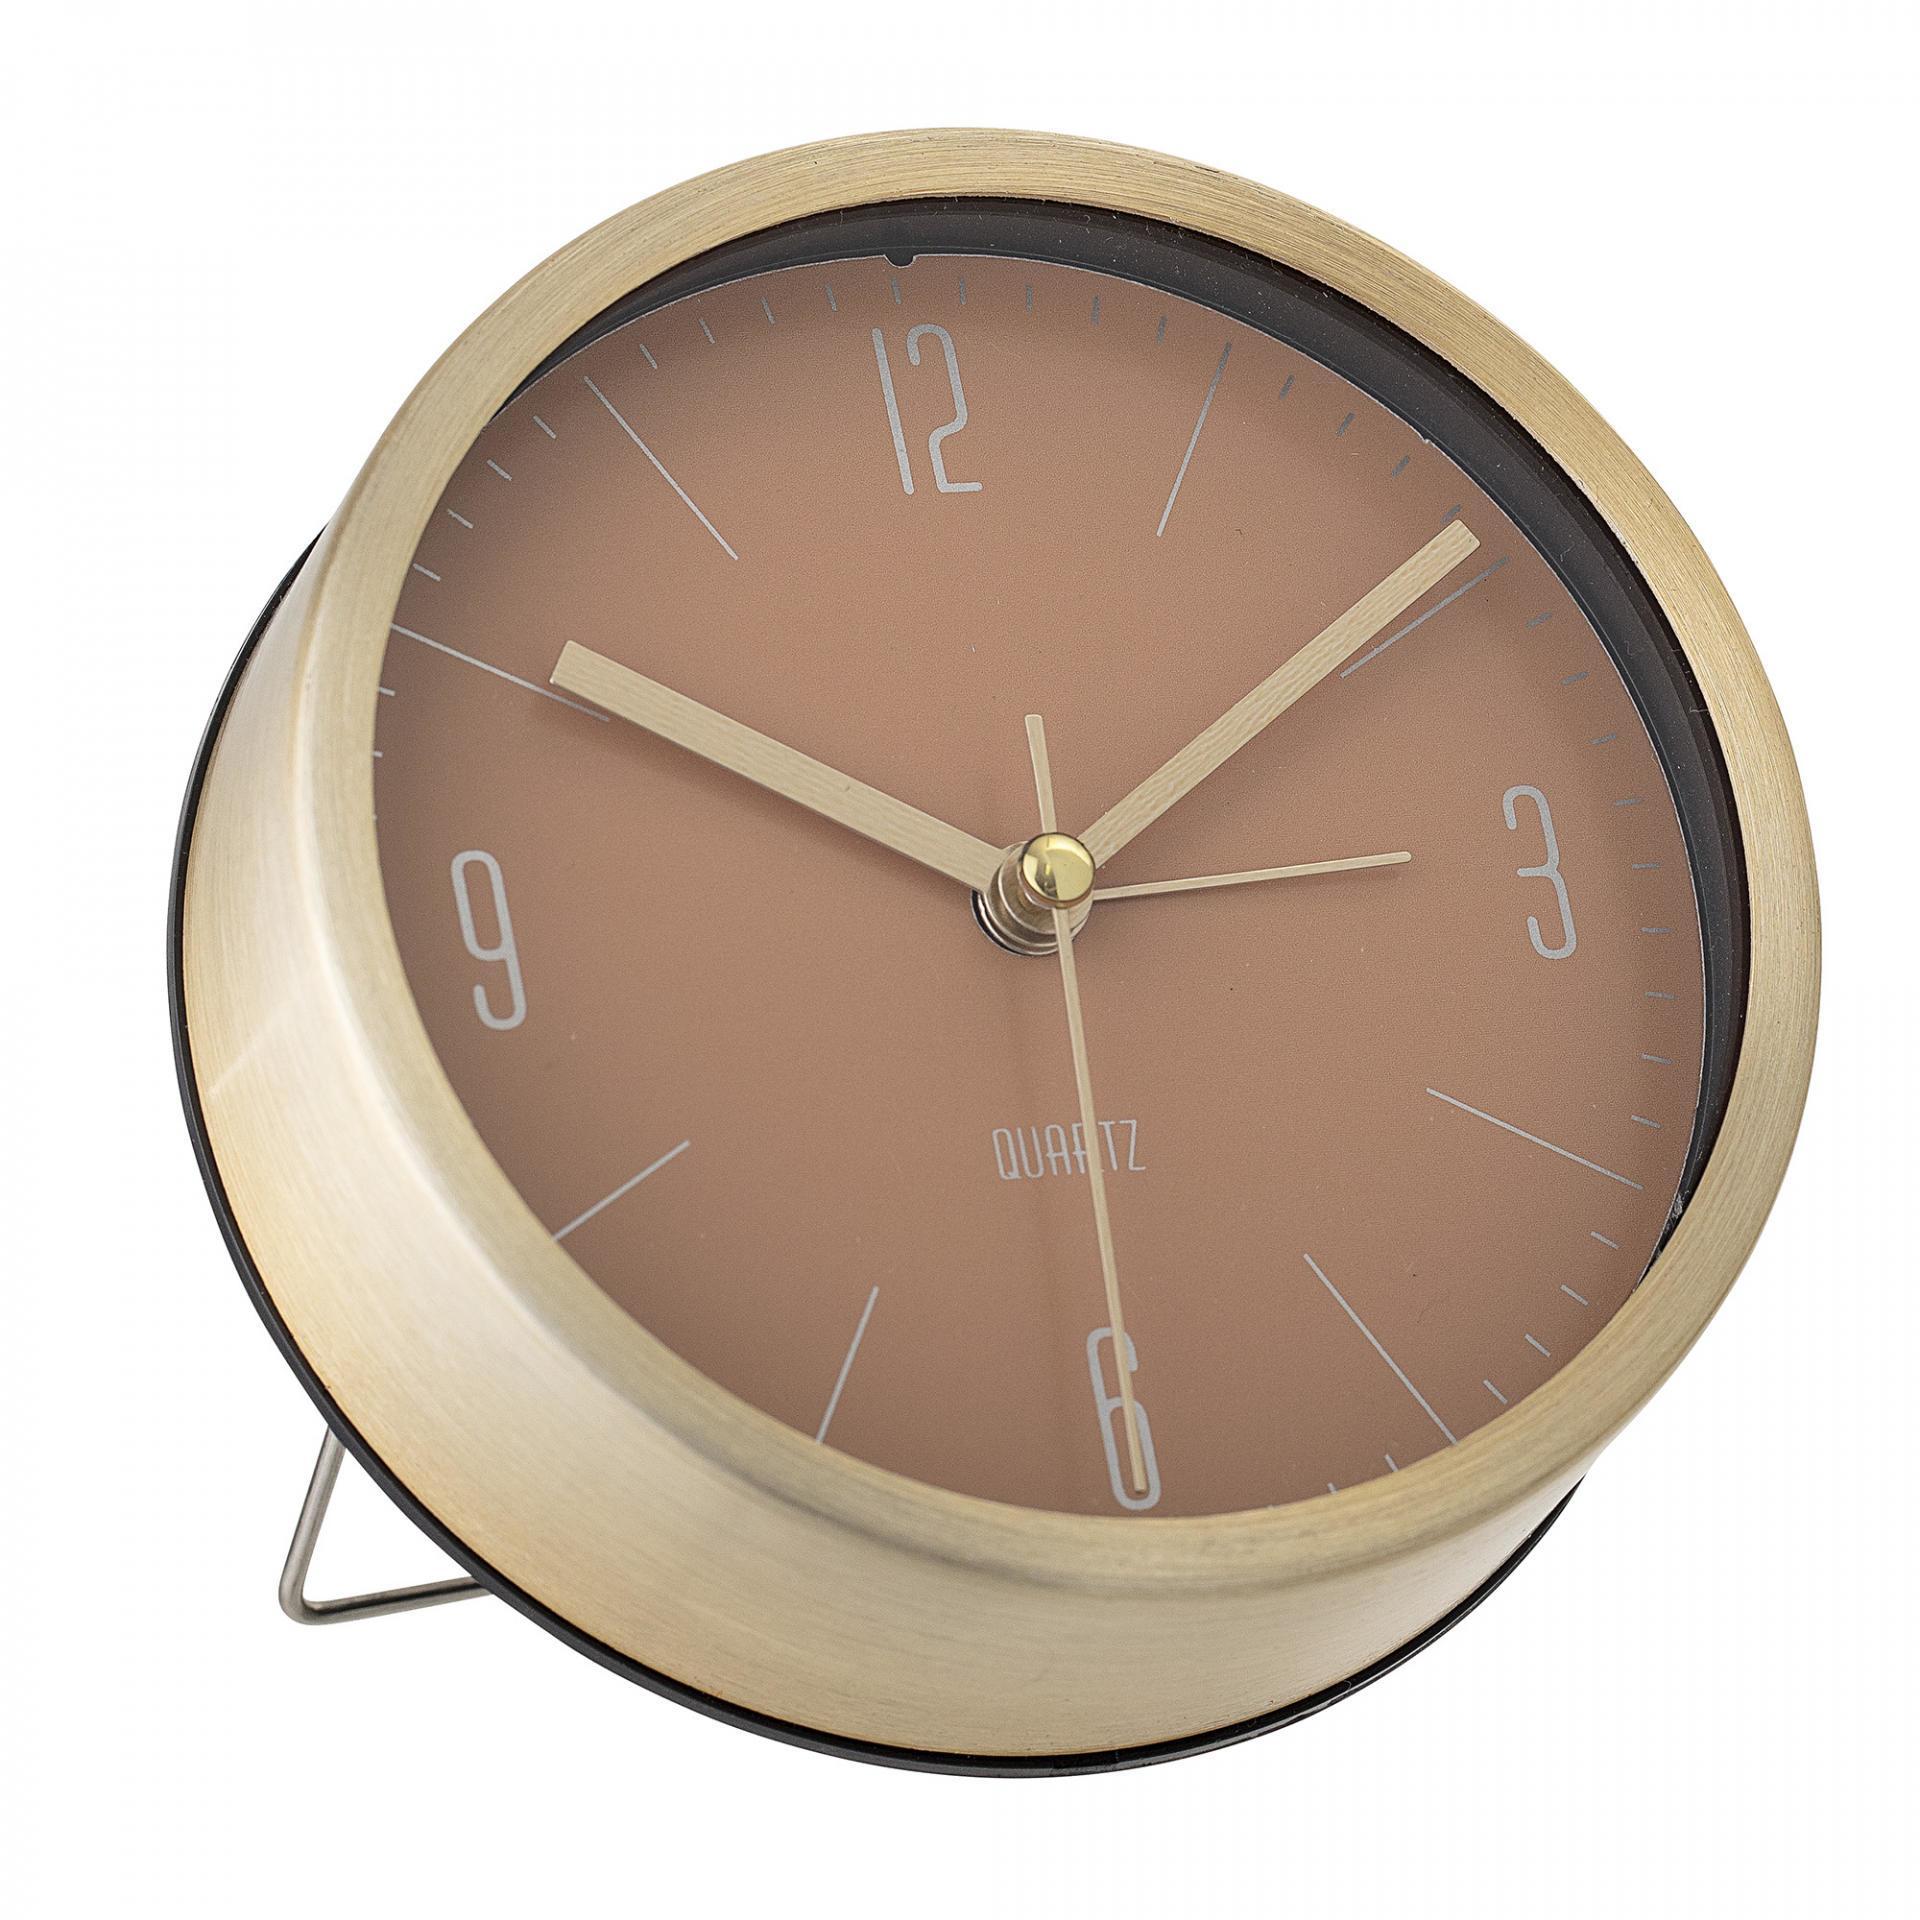 Bloomingville Stolní hodiny Gold&Nude Aluminium, zlatá barva, sklo, kov